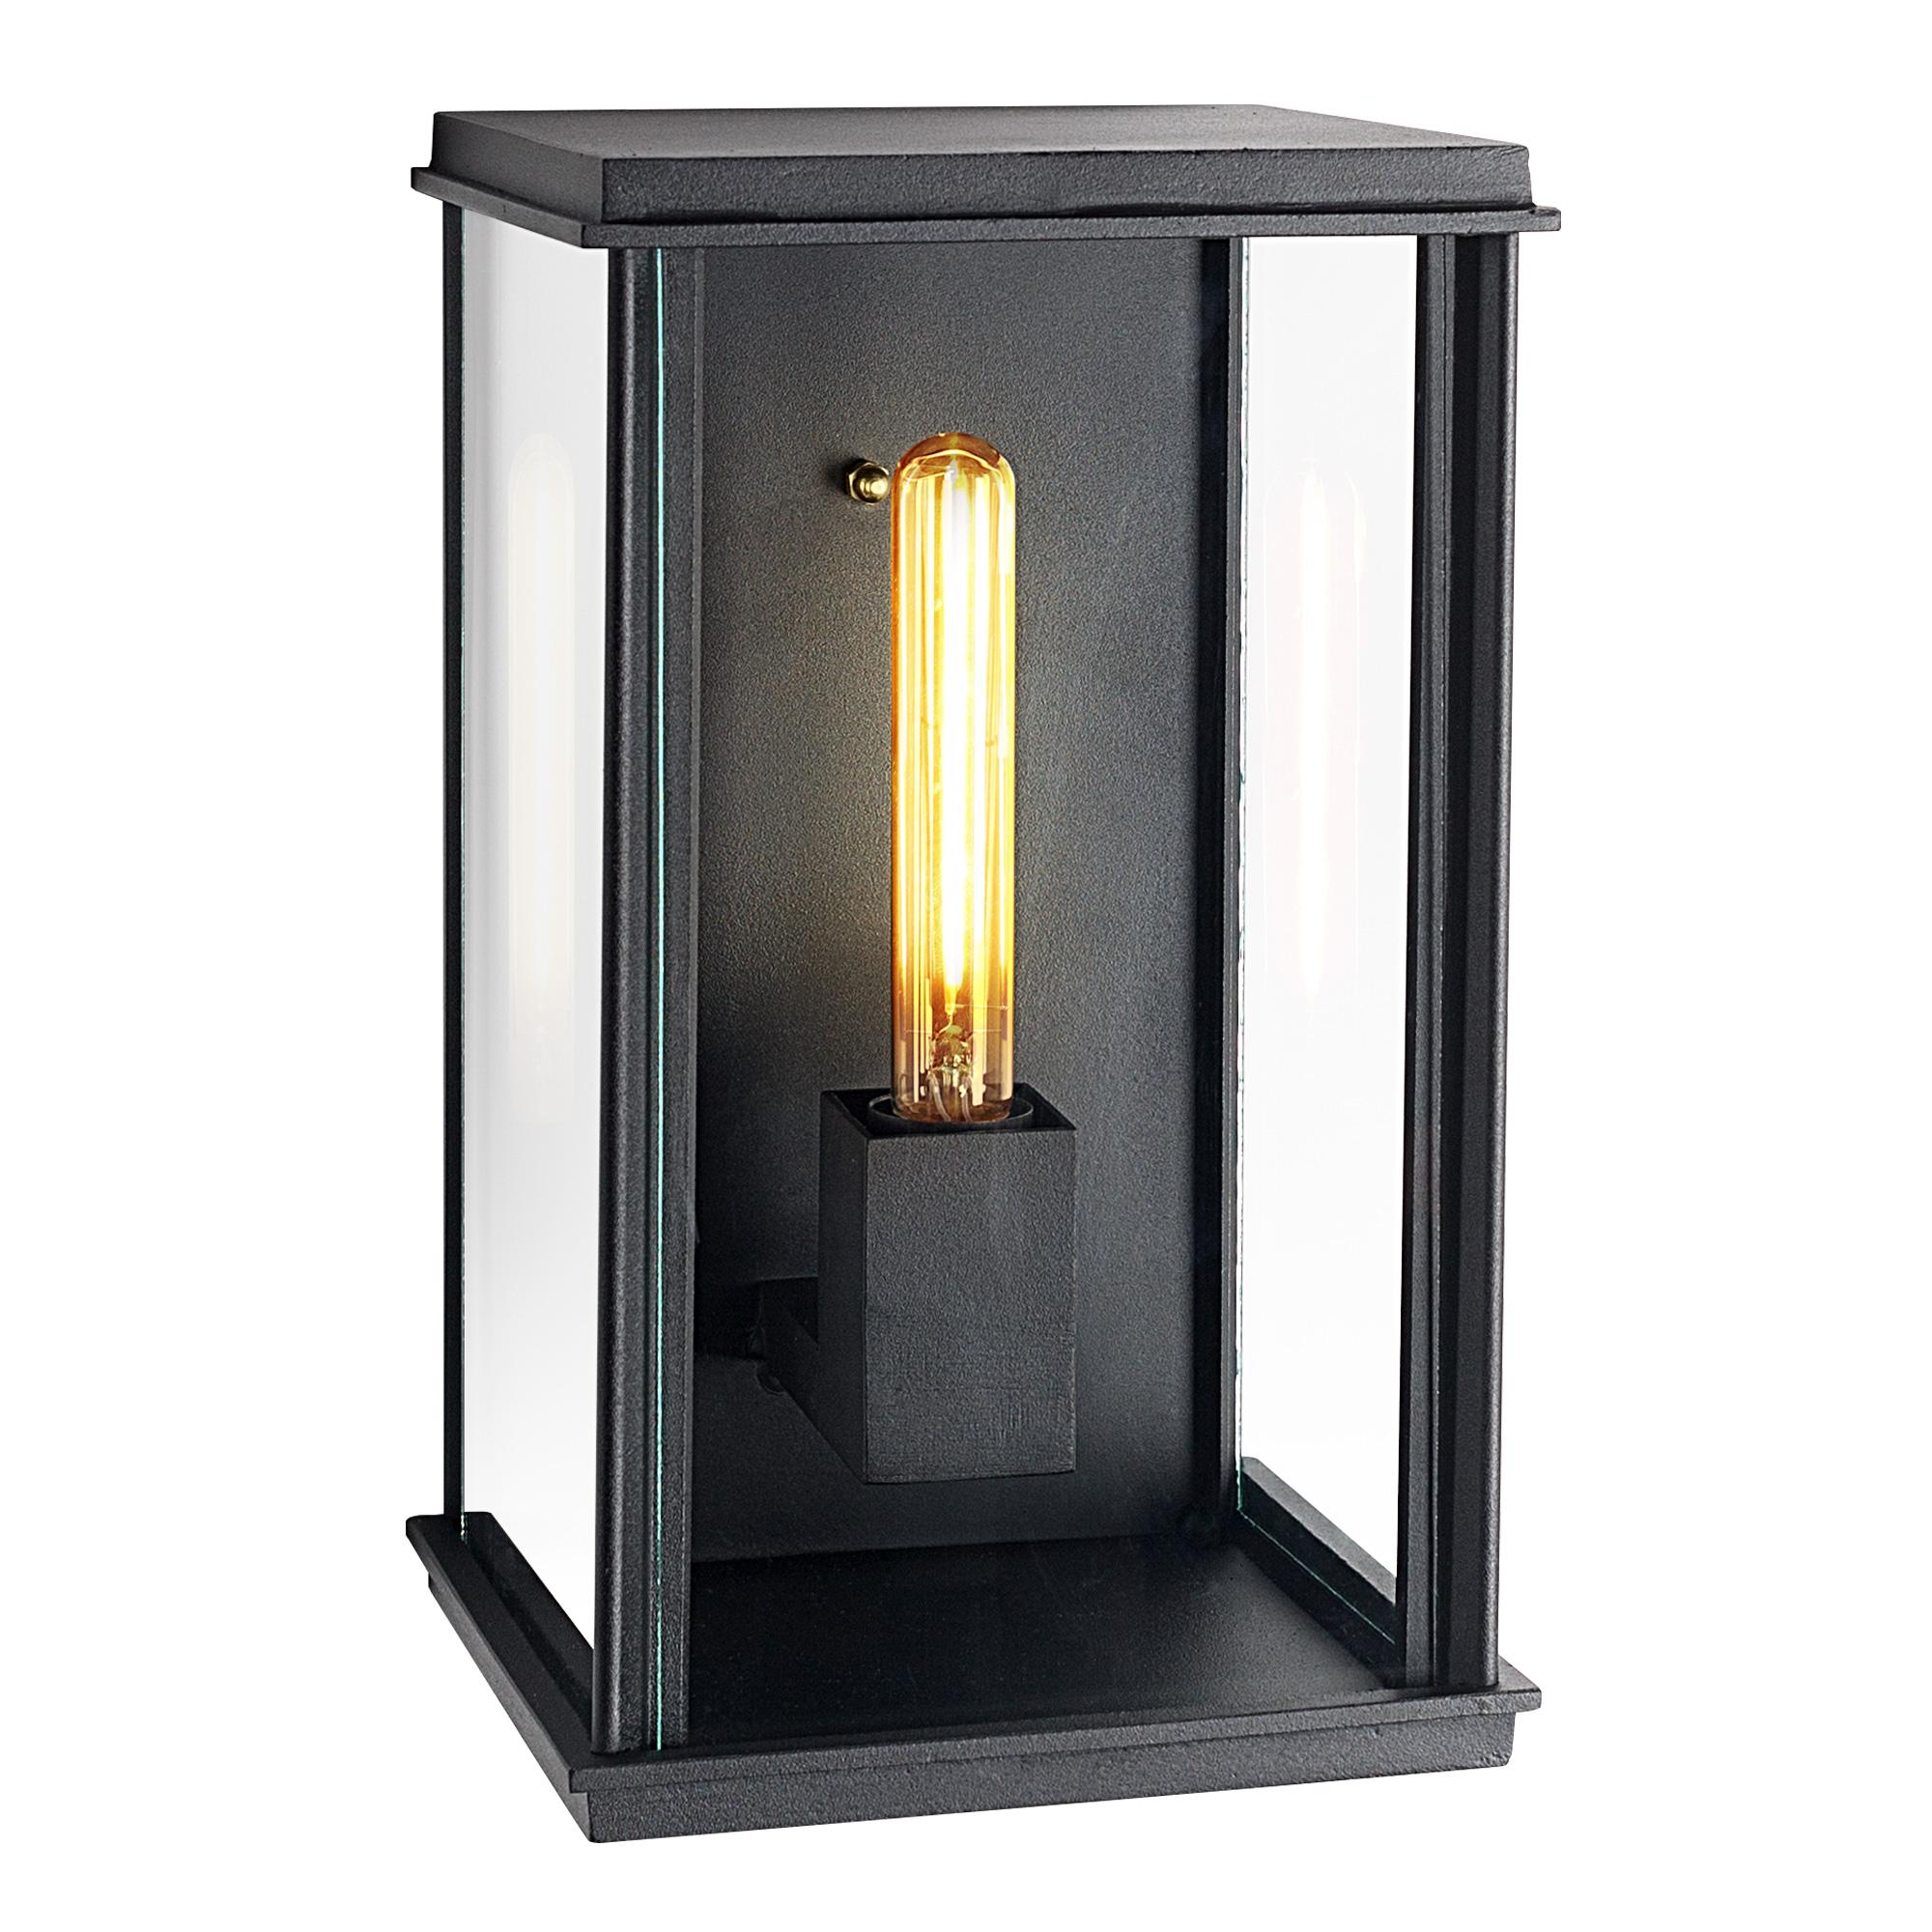 Buitenlamp Capital XL zwart